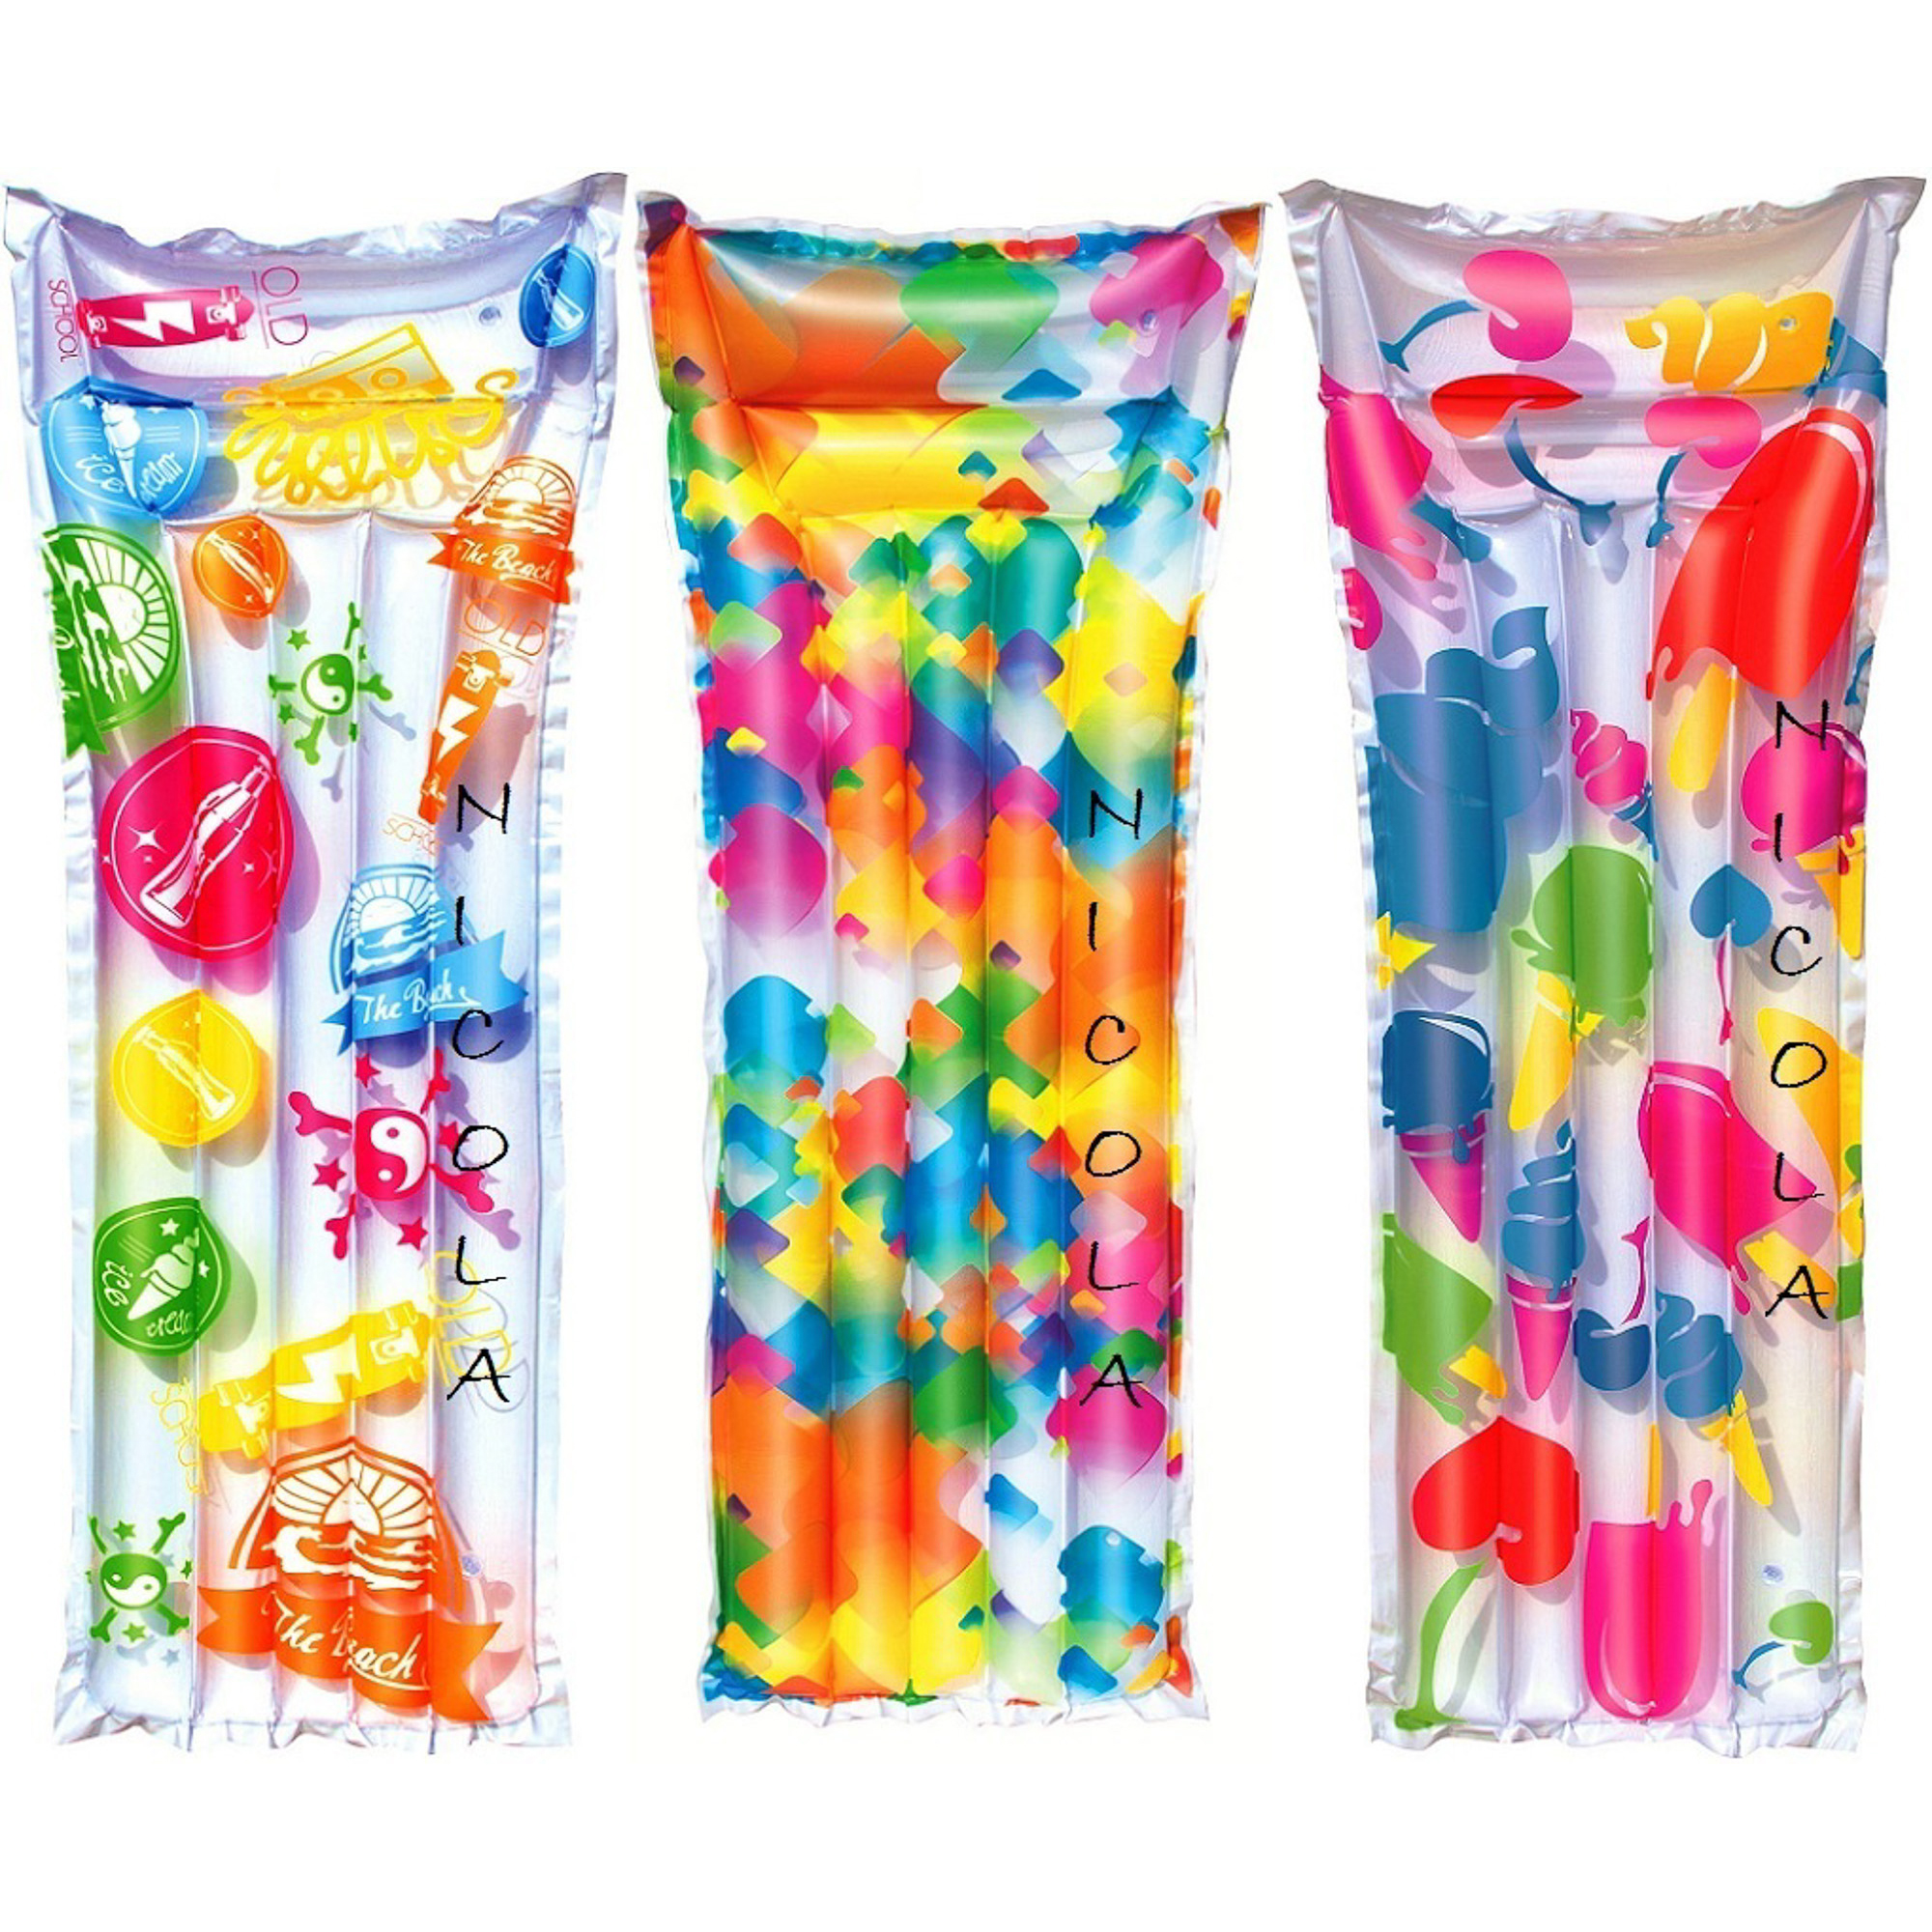 Матрас надувной Best way в трёх расцветках 183х69 см (44033)